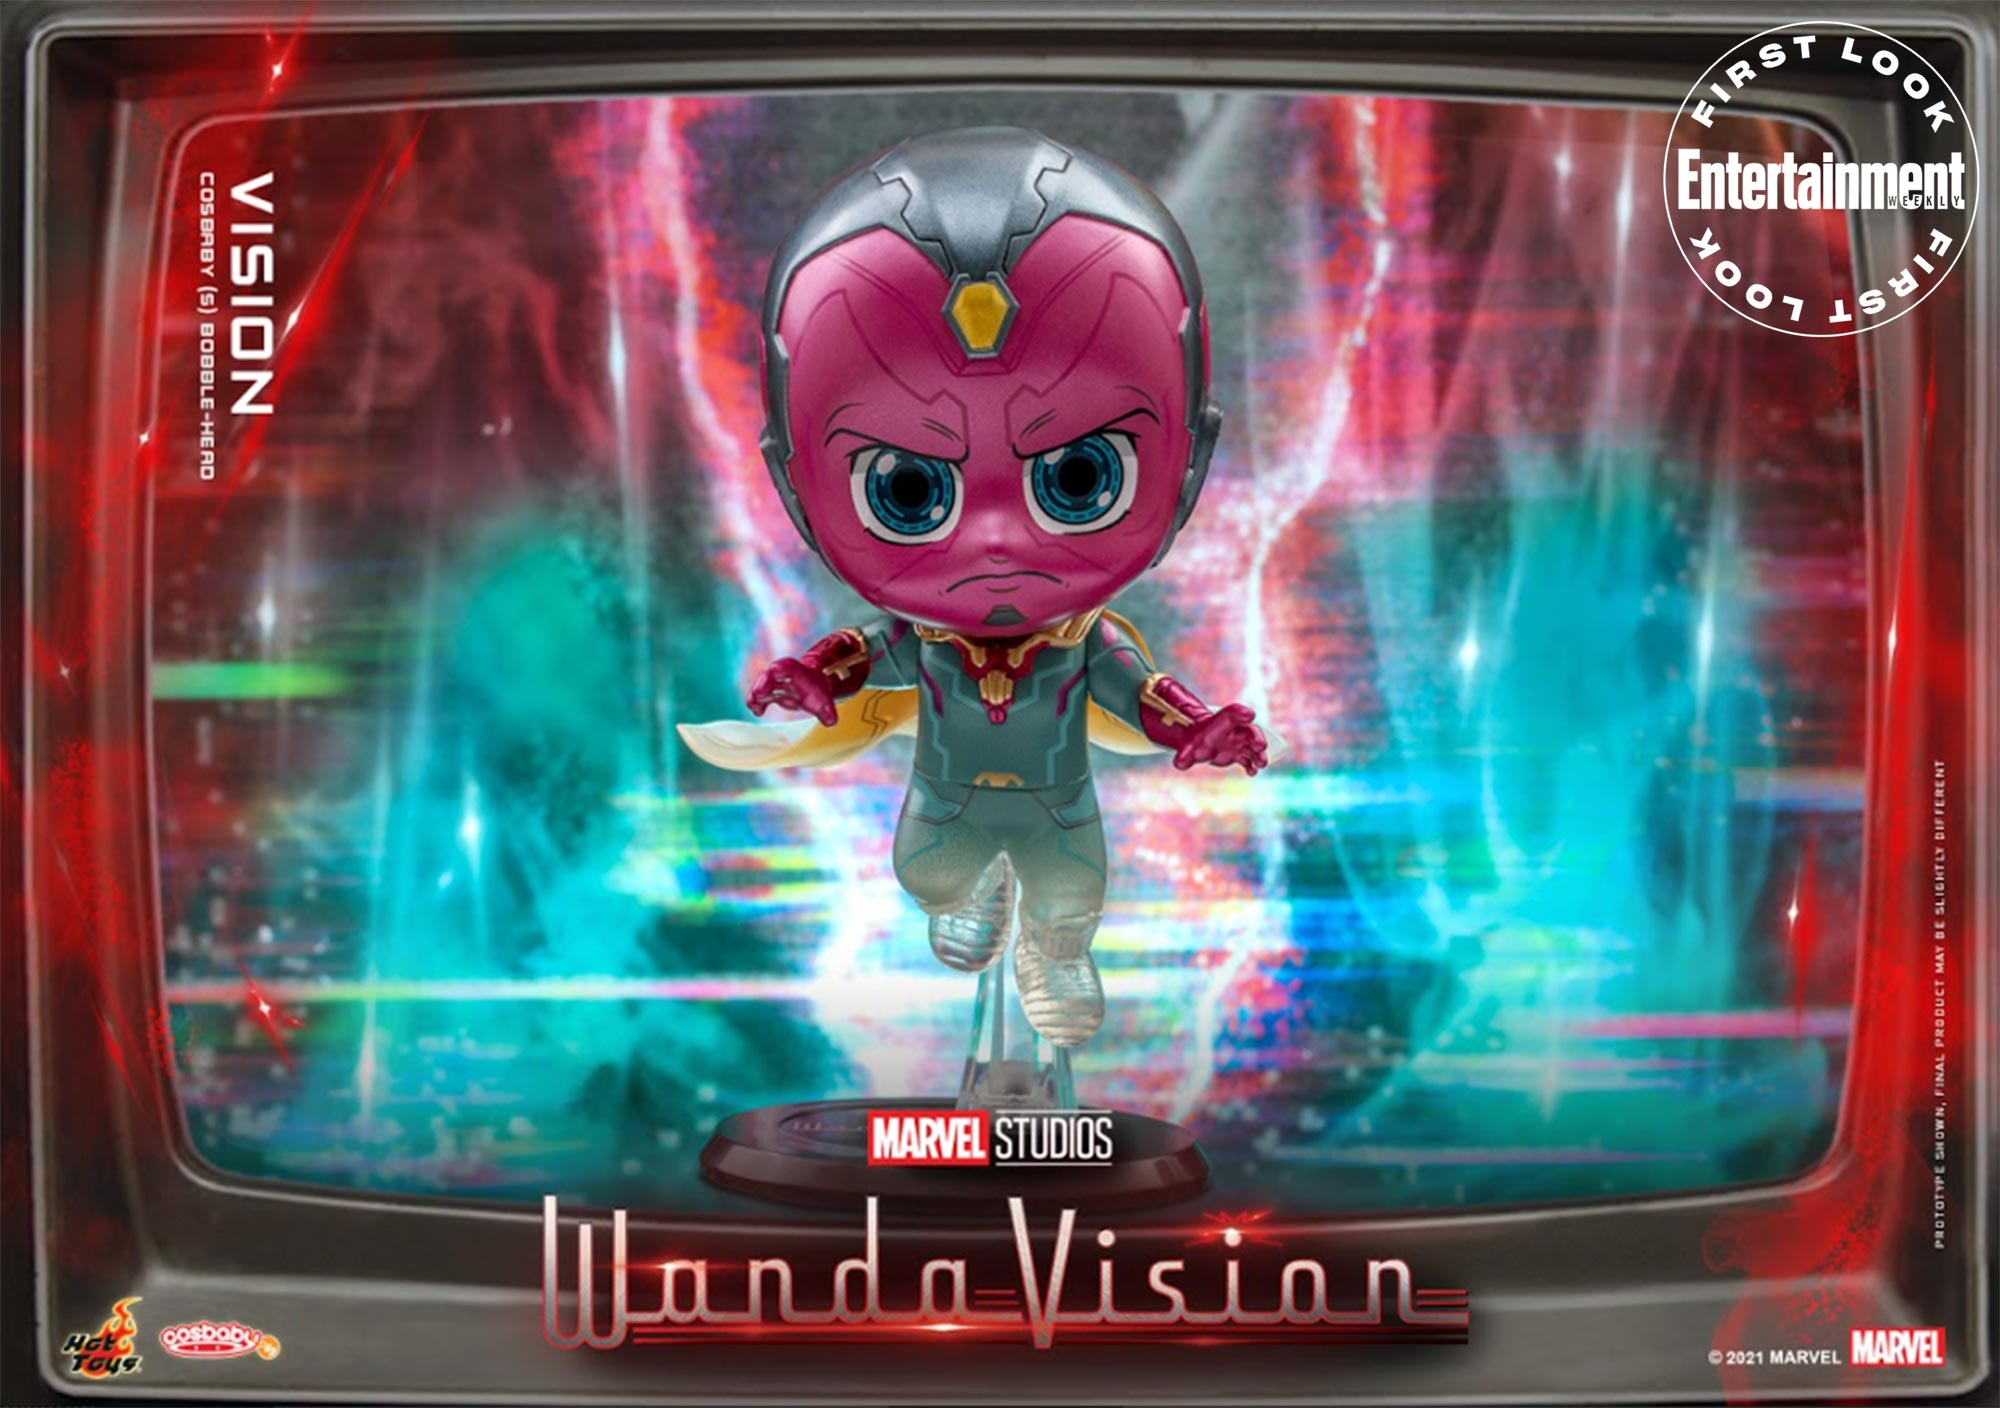 WandaVision merchandise